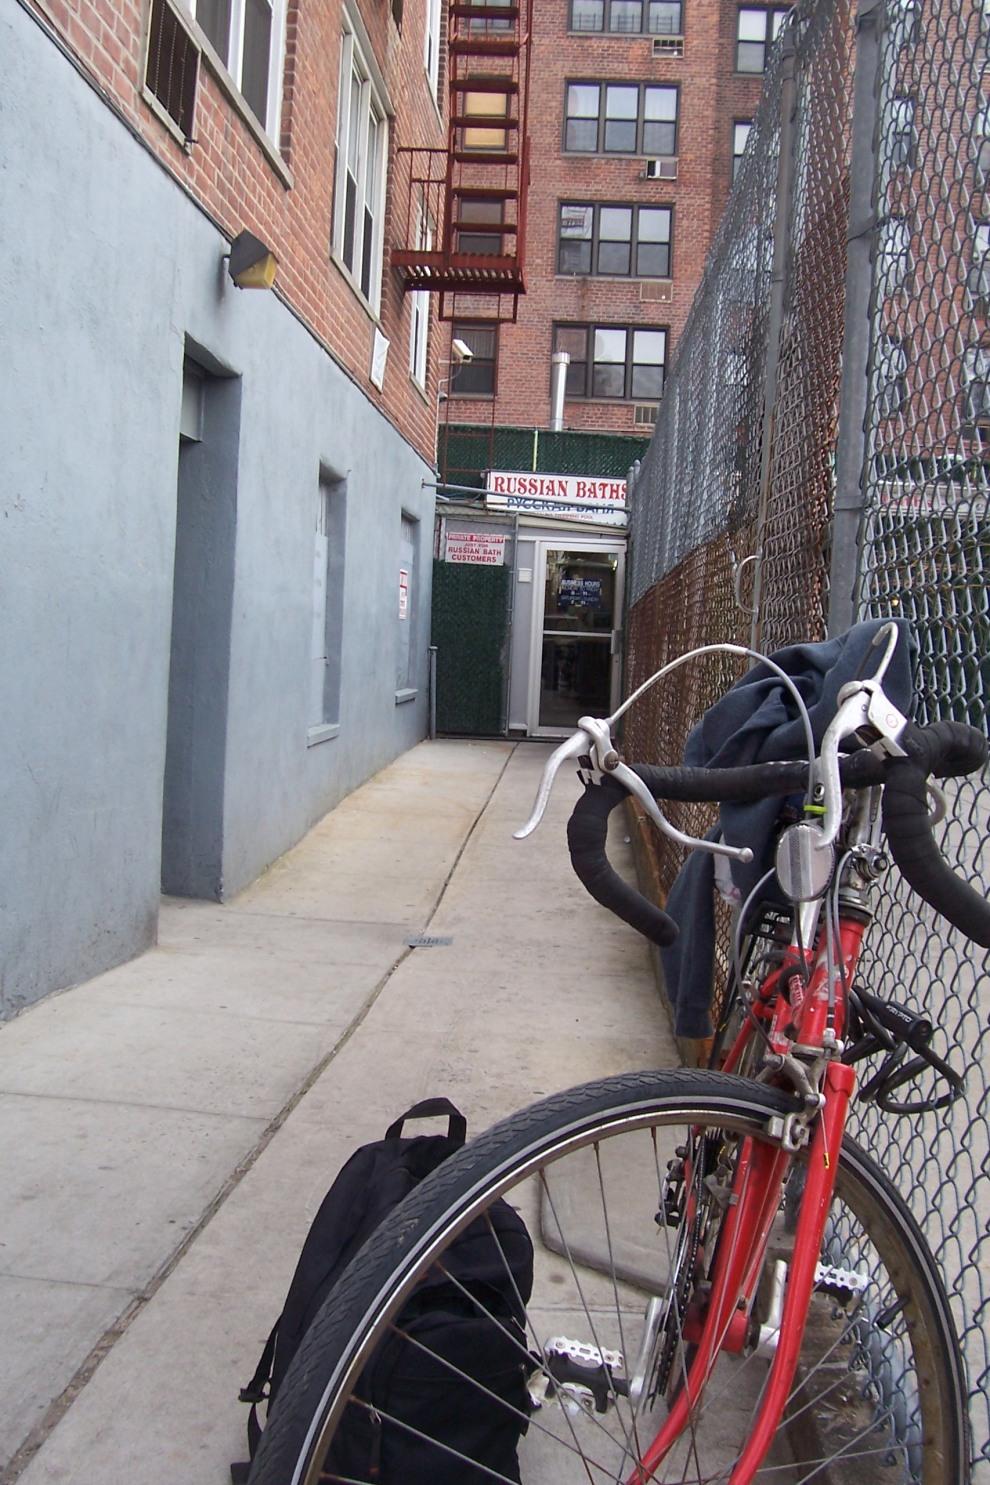 Russian Baths of Neck Road - 1200 Gravesend Ave., Brooklyn.